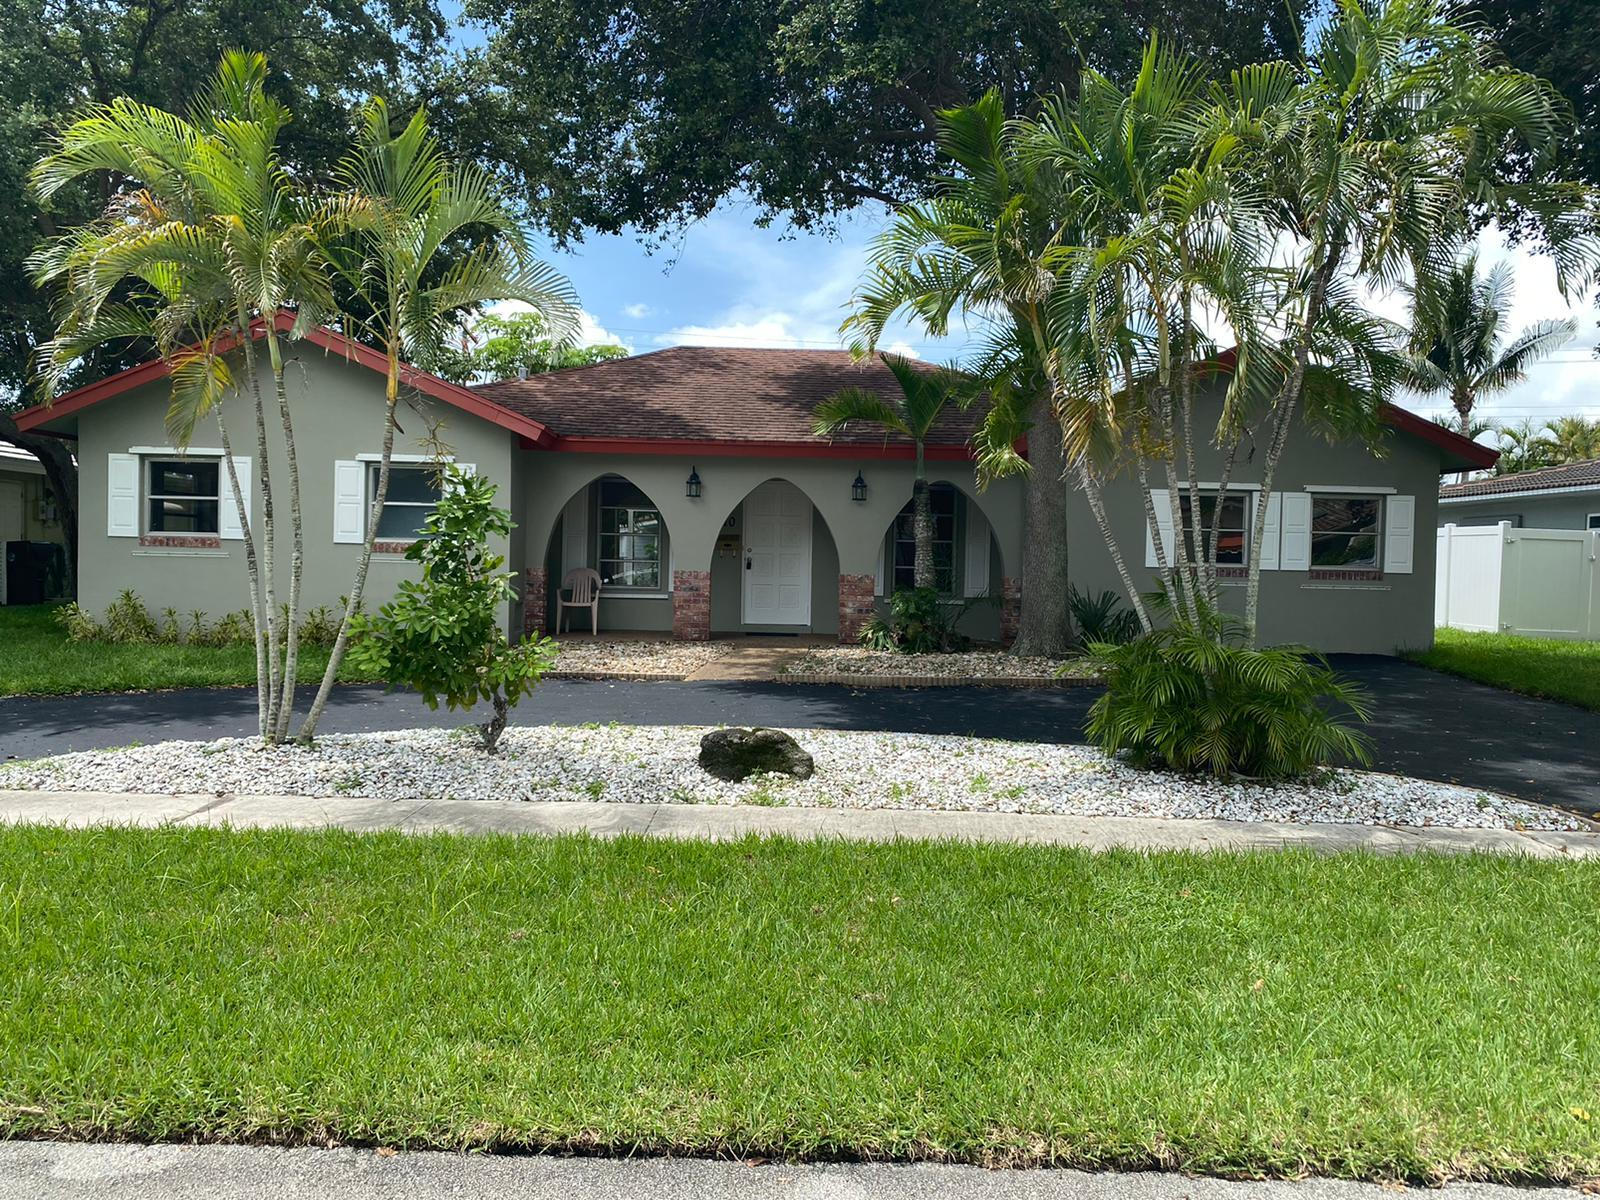 Photo of  Boca Raton, FL 33486 MLS RX-10640786